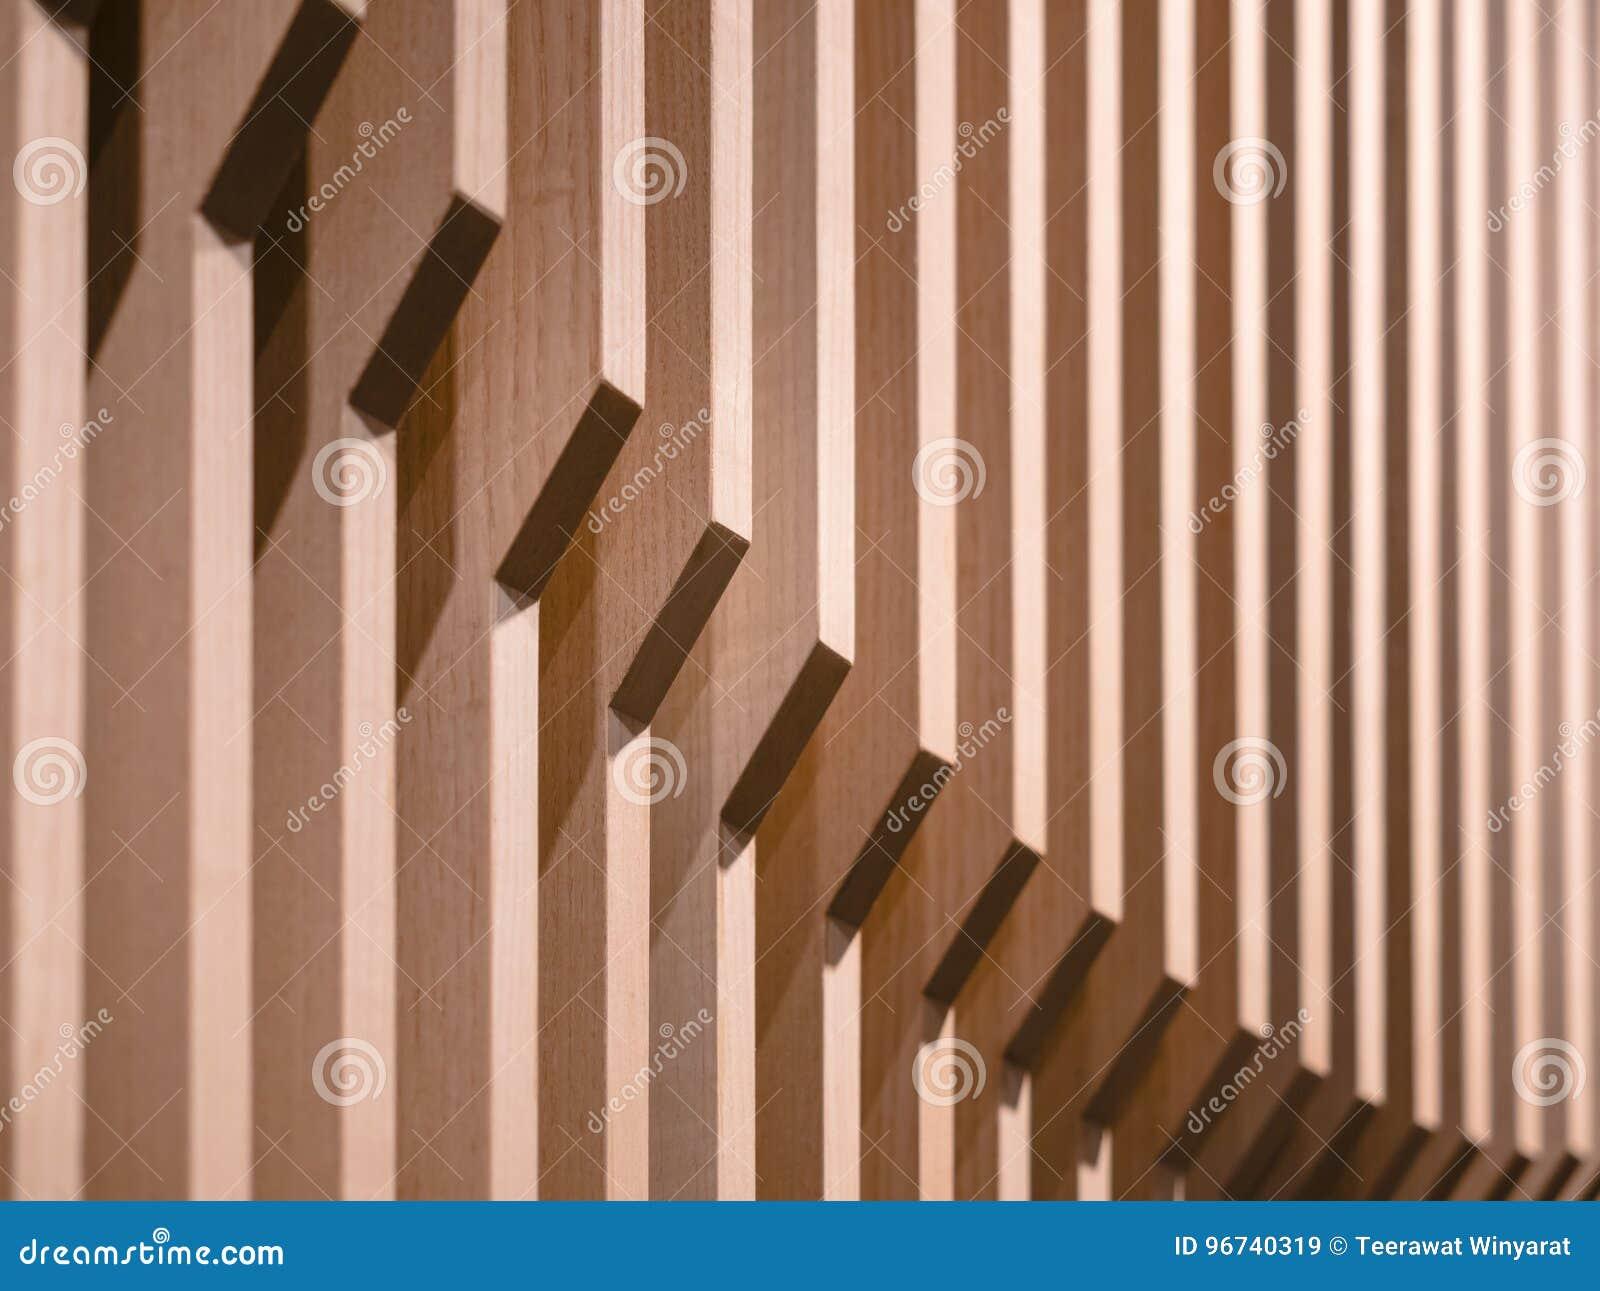 Architecture details Wooden wall pattern design